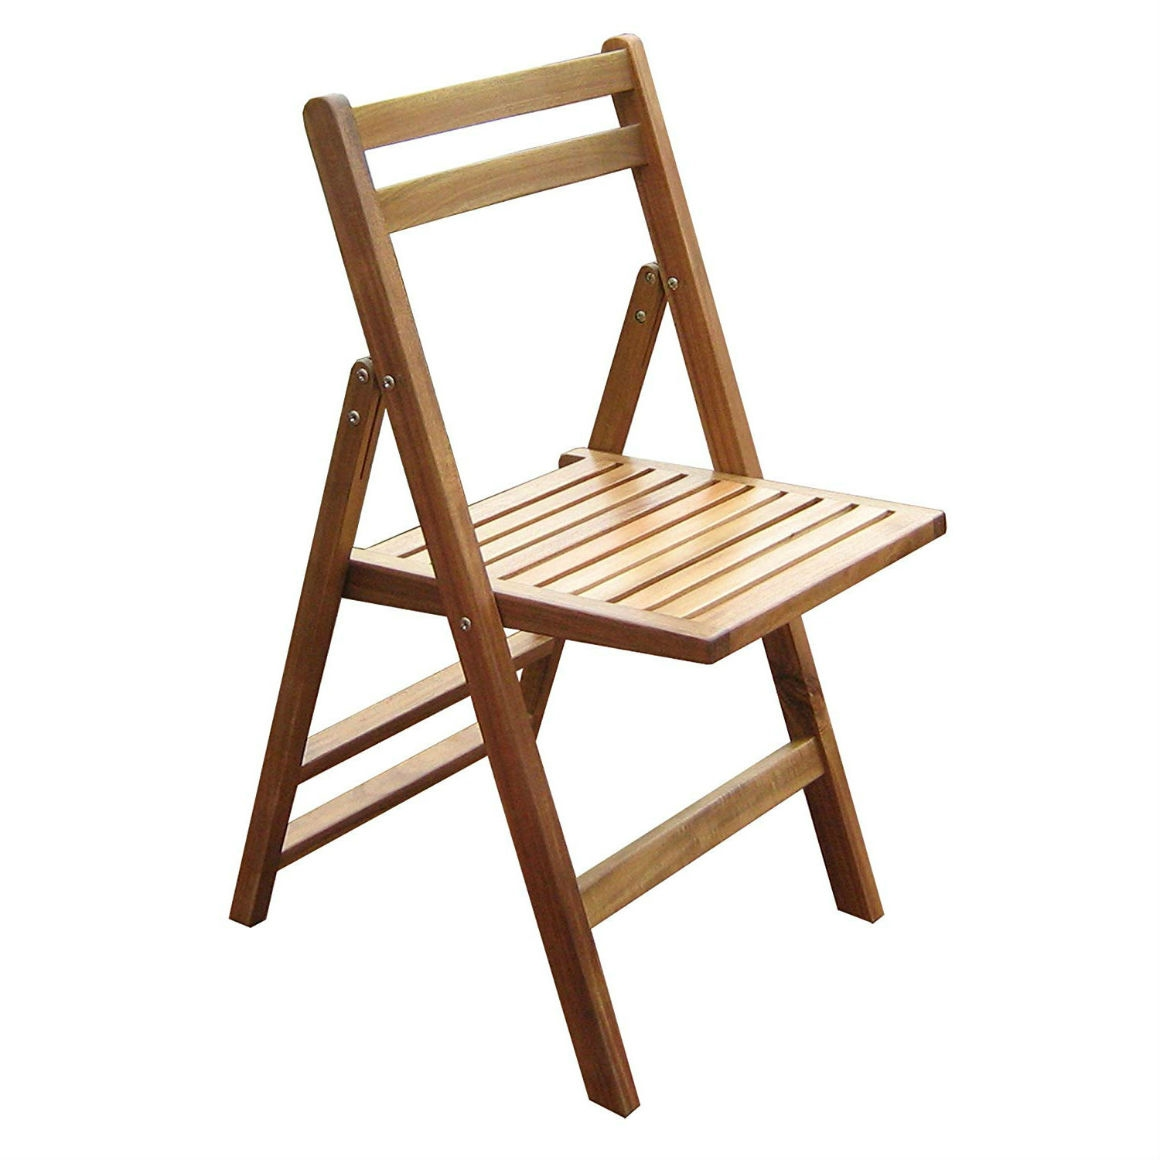 Wondrous Set Of 4 Outdoor Wooden Folding Patio Chairs Short Links Chair Design For Home Short Linksinfo